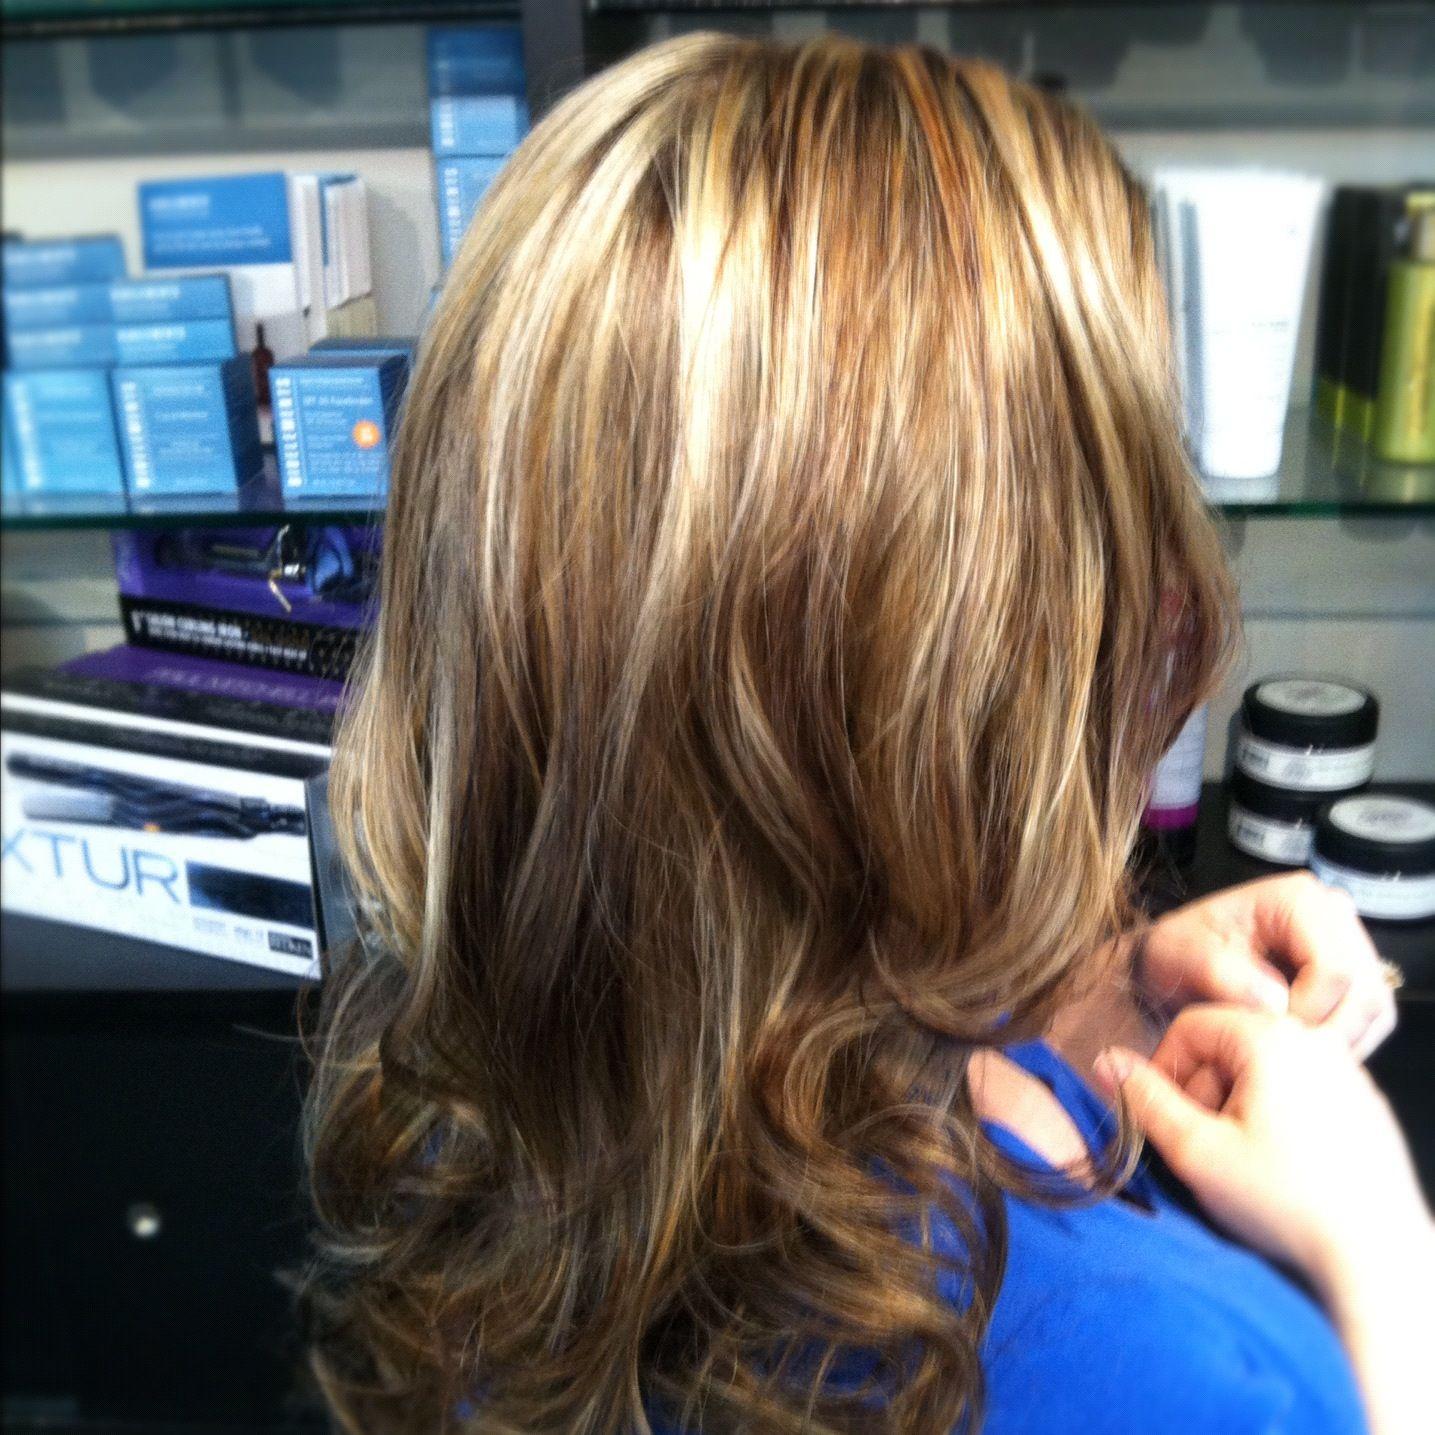 Janelle S Foil Golden Brown With Blonde